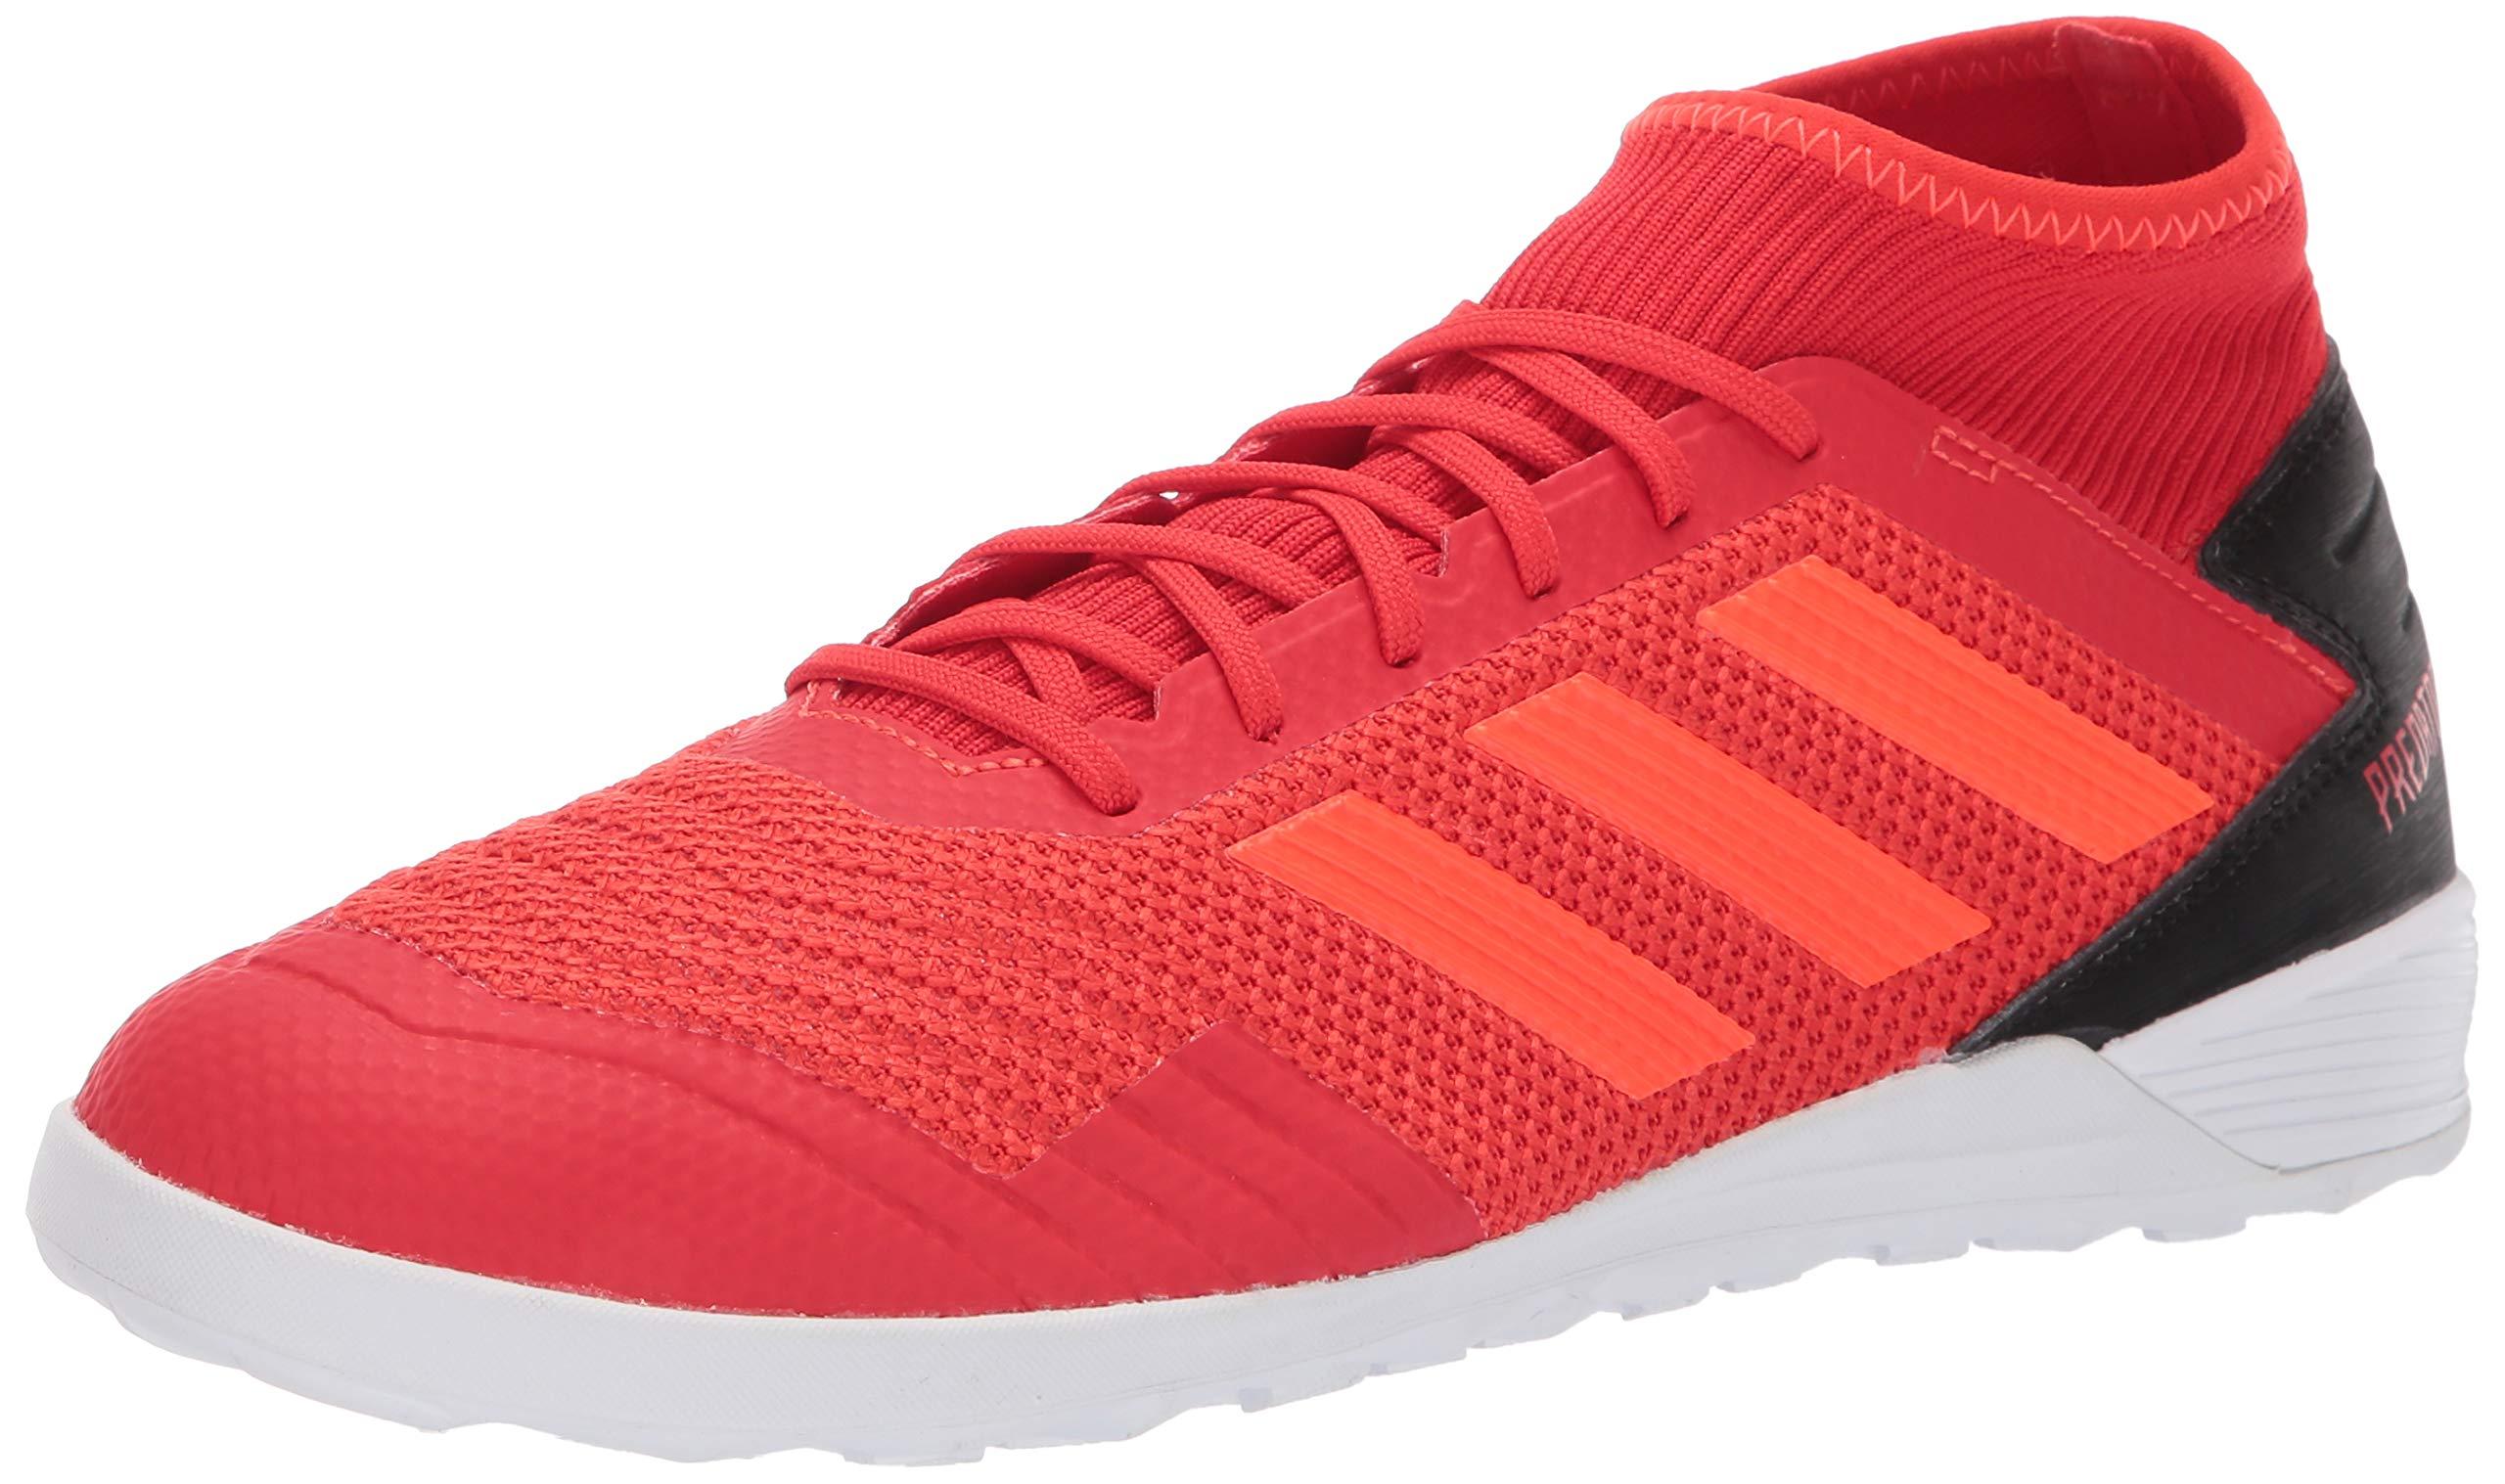 adidas Men's Predator 19.3 Indoor, Active Solar red/Black, 7 M US